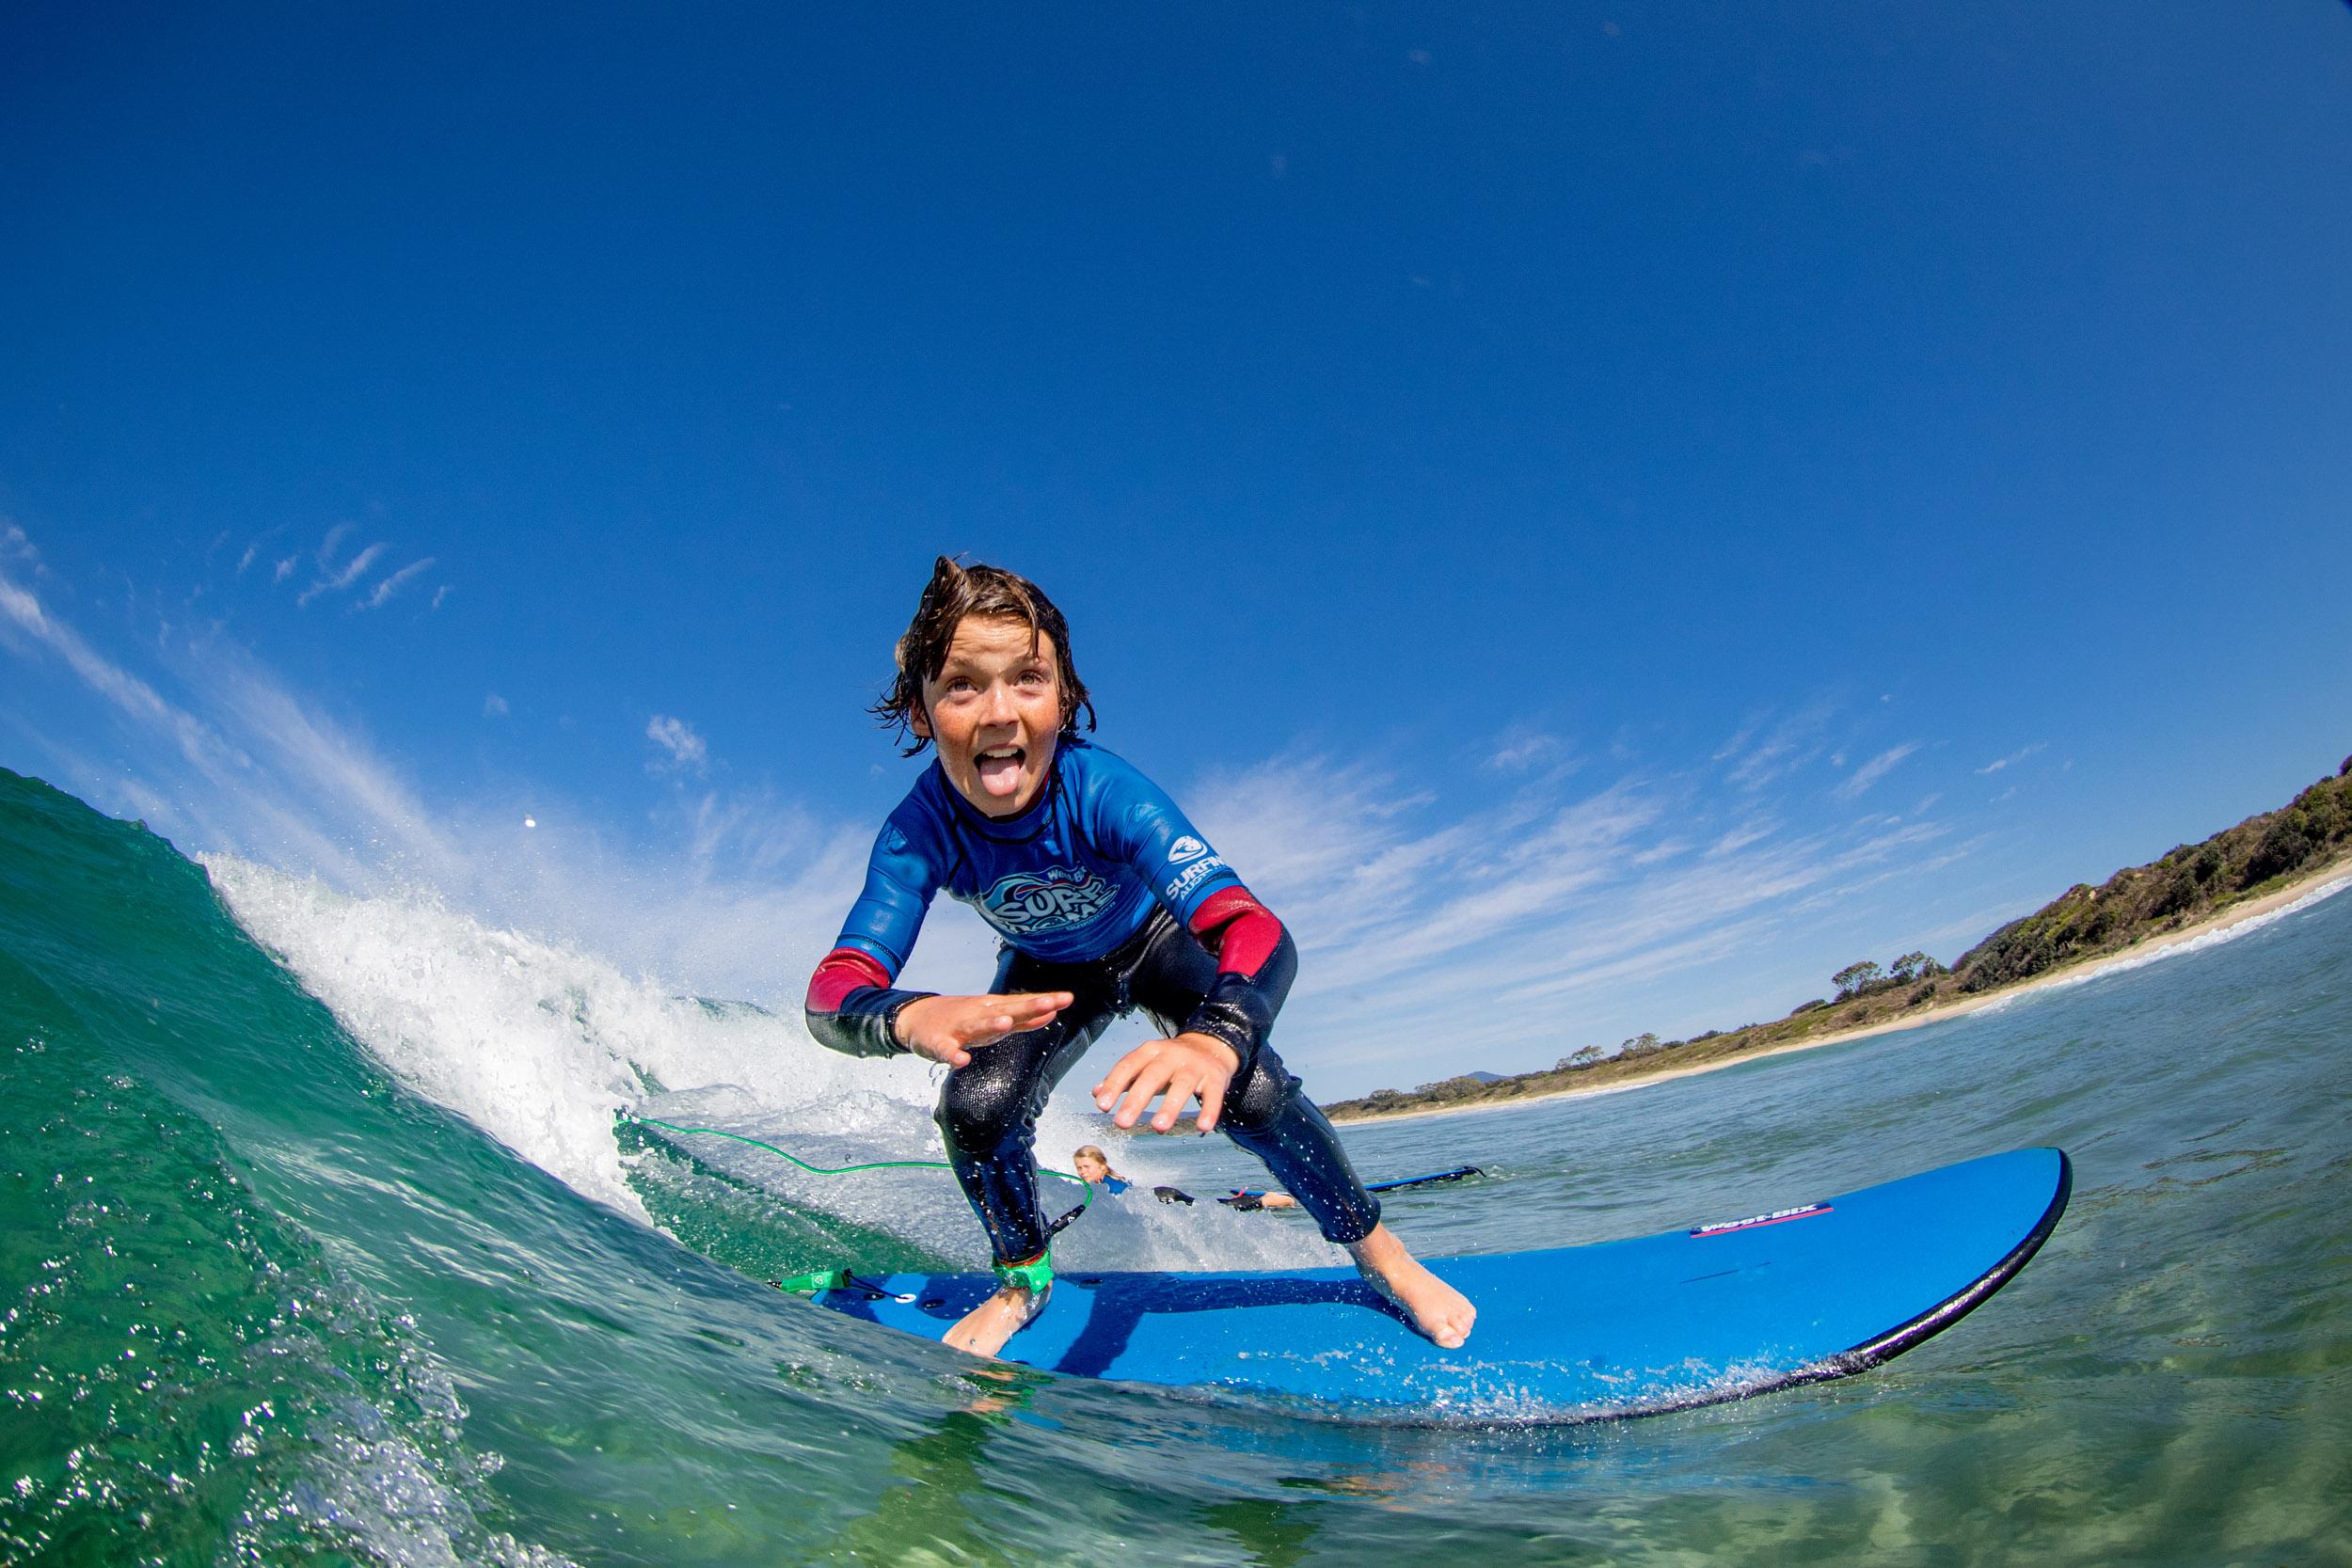 surfing-australia-surf-groms-photography.jpg